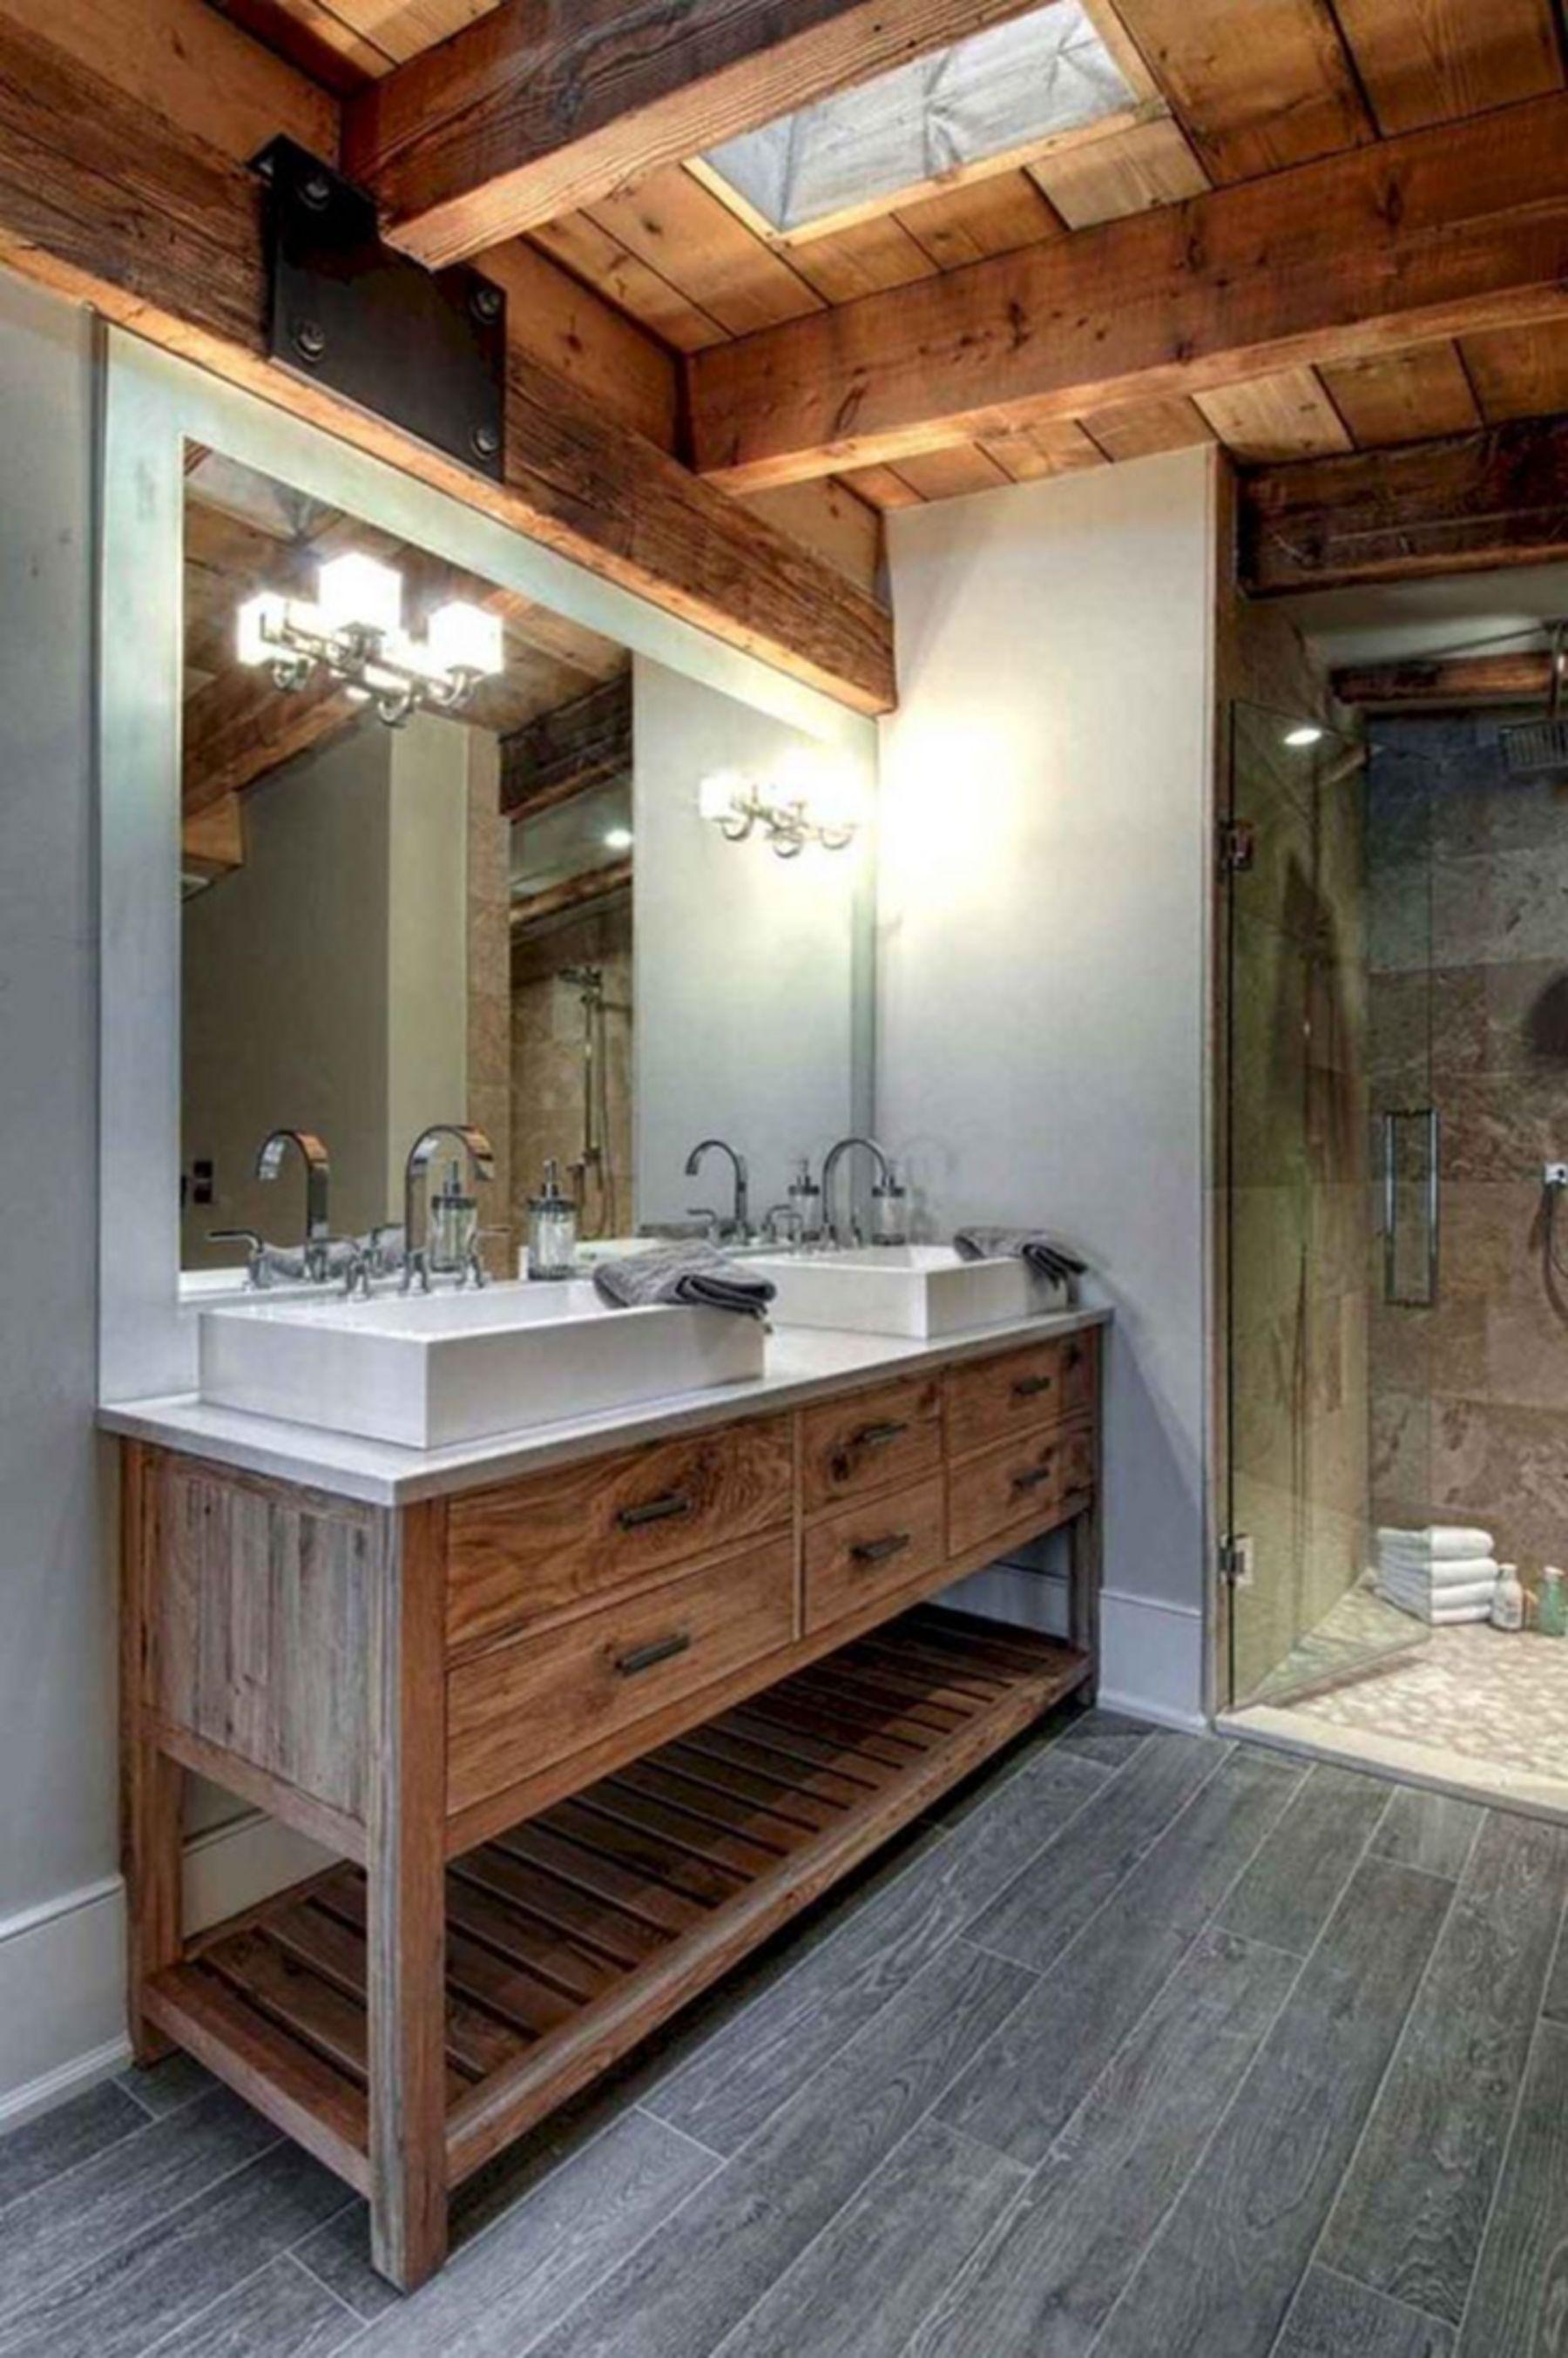 10 Stunning Modern Rustic Bathroom Design Ideas For Your Home Rusticbathroomdesigns The Modern Bathroom Remodel Rustic Master Bathroom Rustic Modern Bathroom